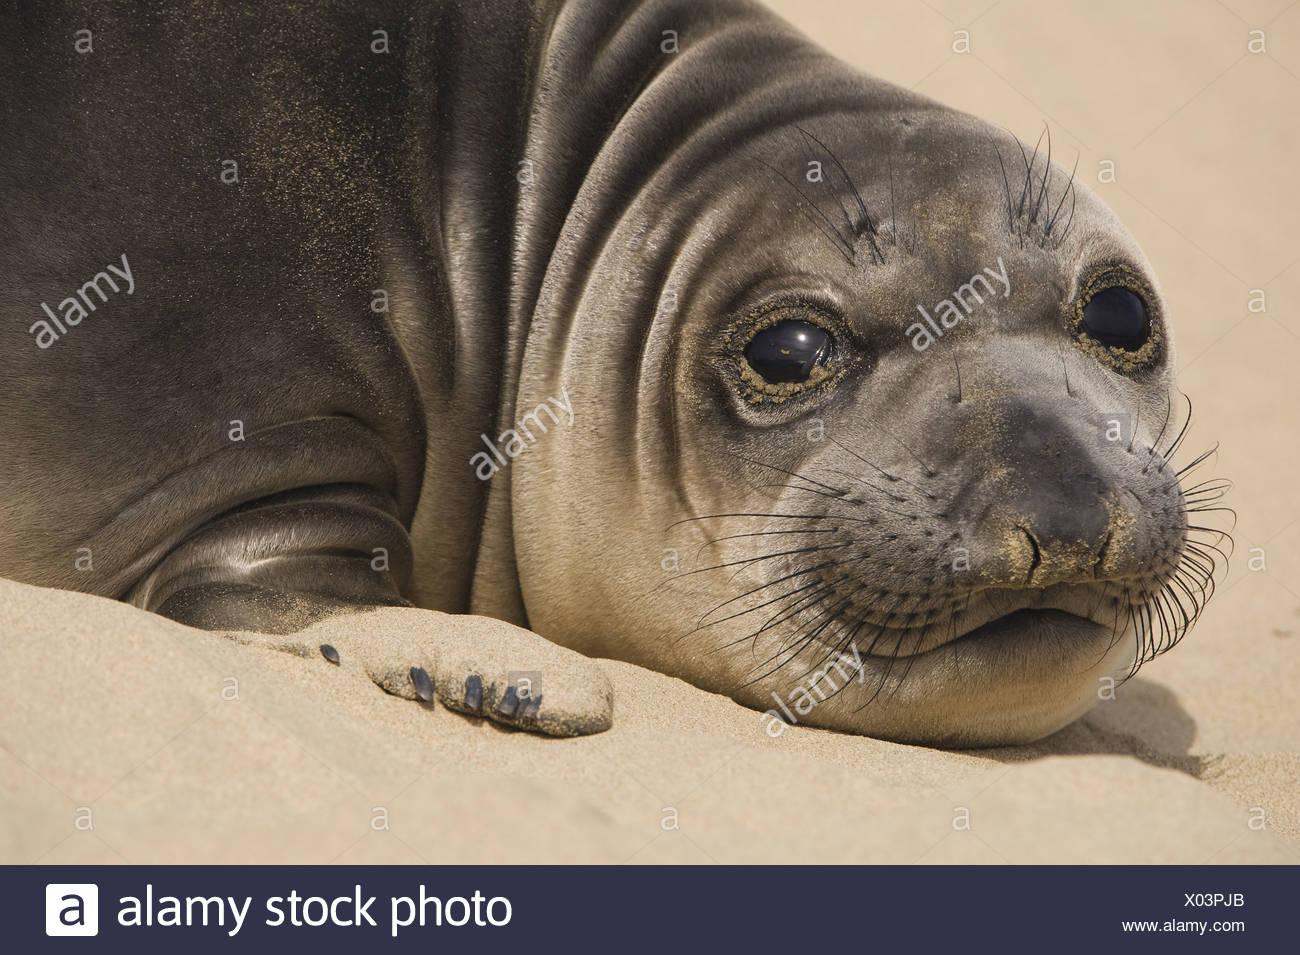 Ano Nuevo State Reserve California USA Northern elephant seal pup Miroungangustirostris - Stock Image